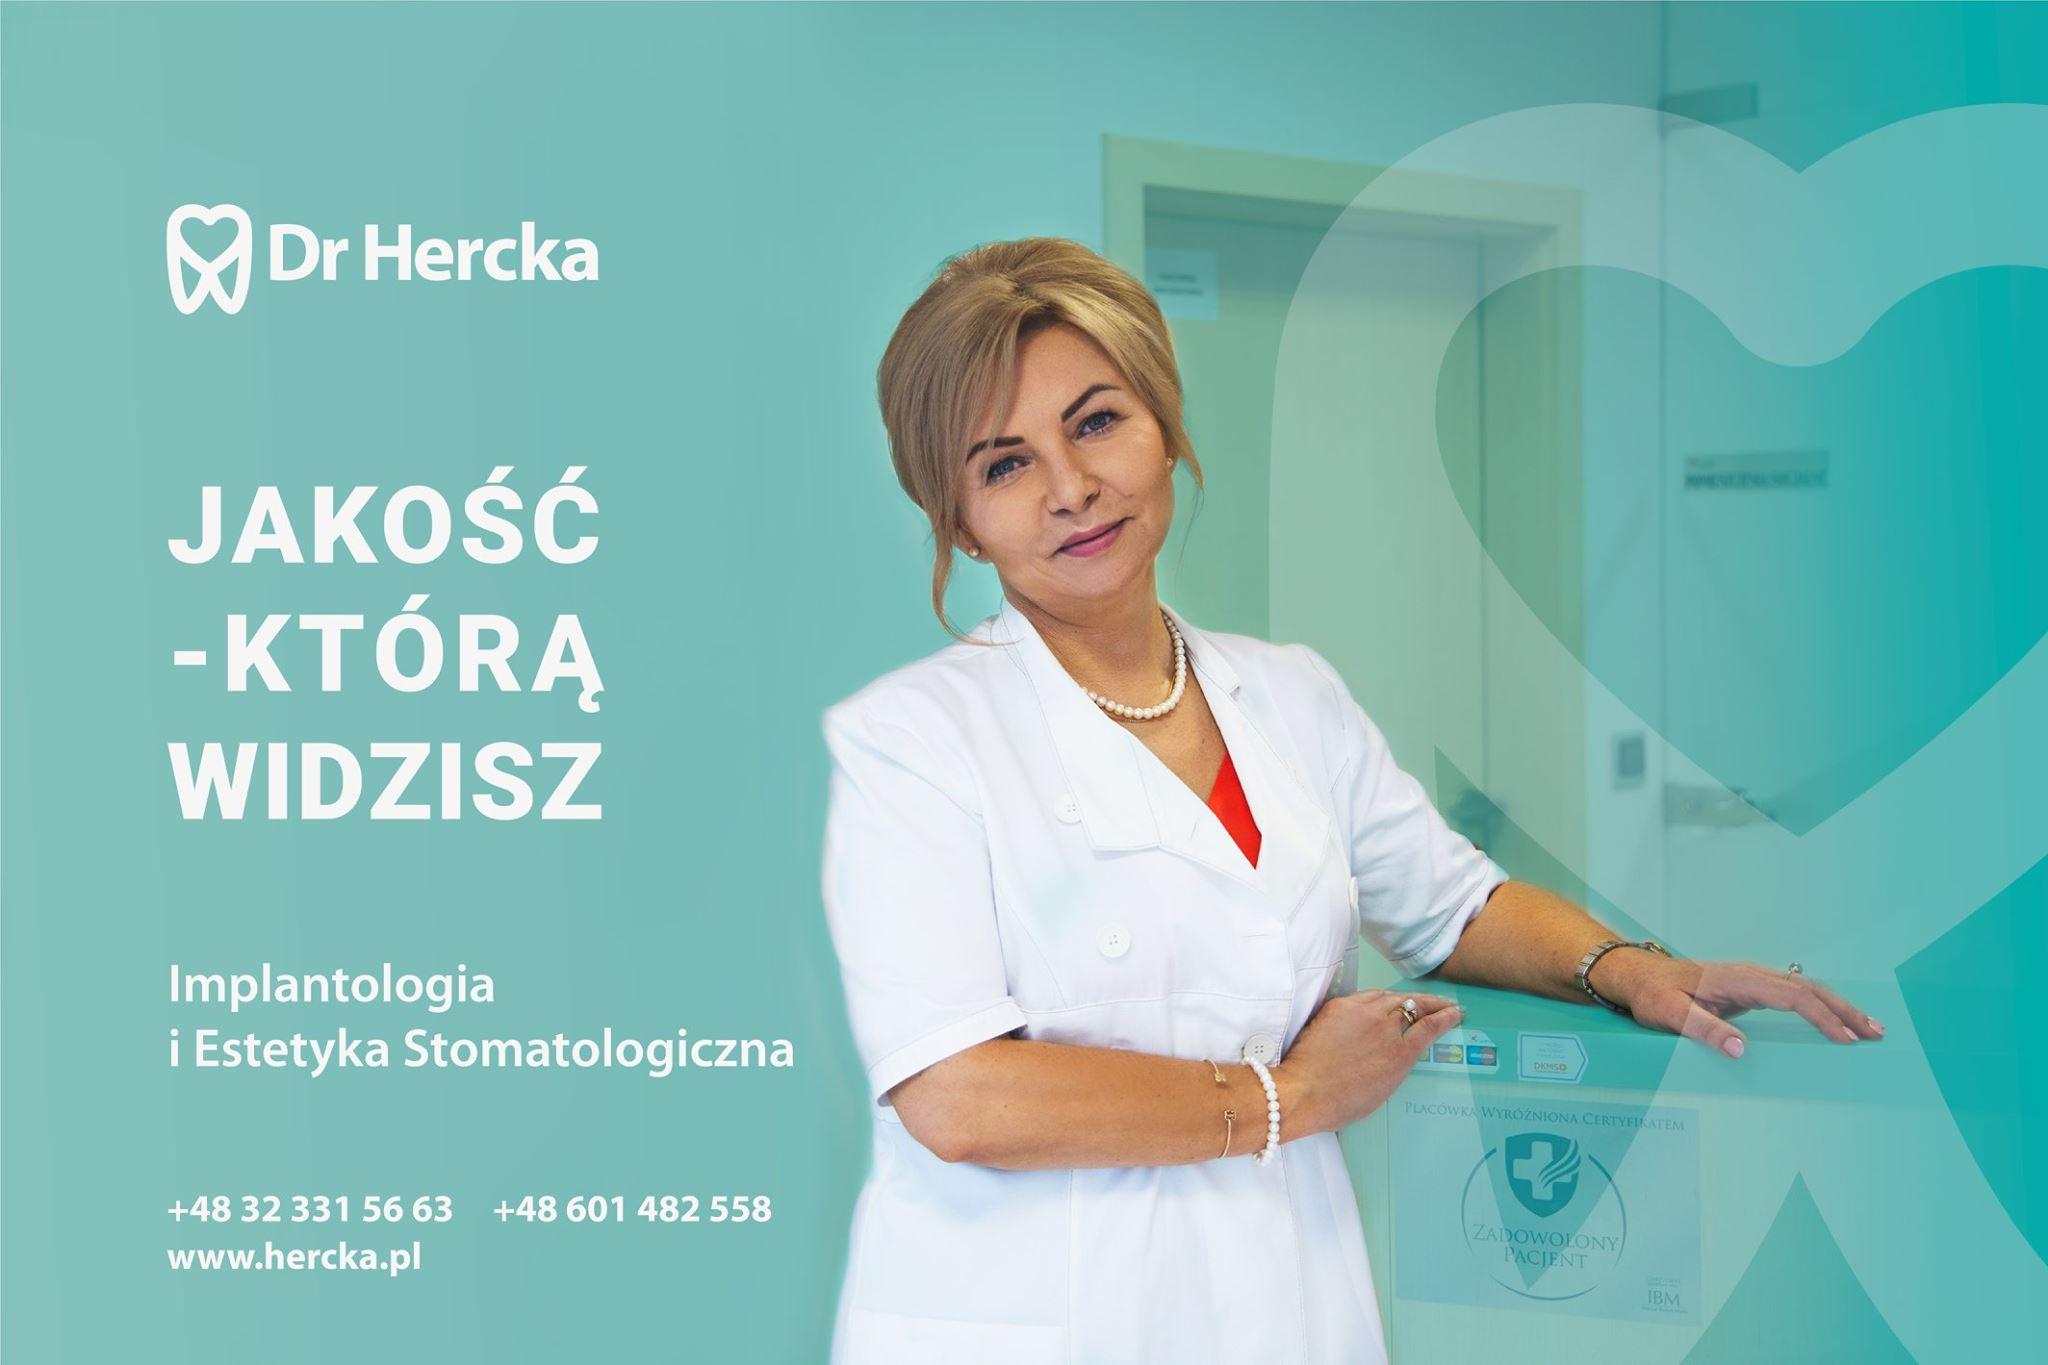 Realizacja dla Dr Hercka - stomatolog Gliwice